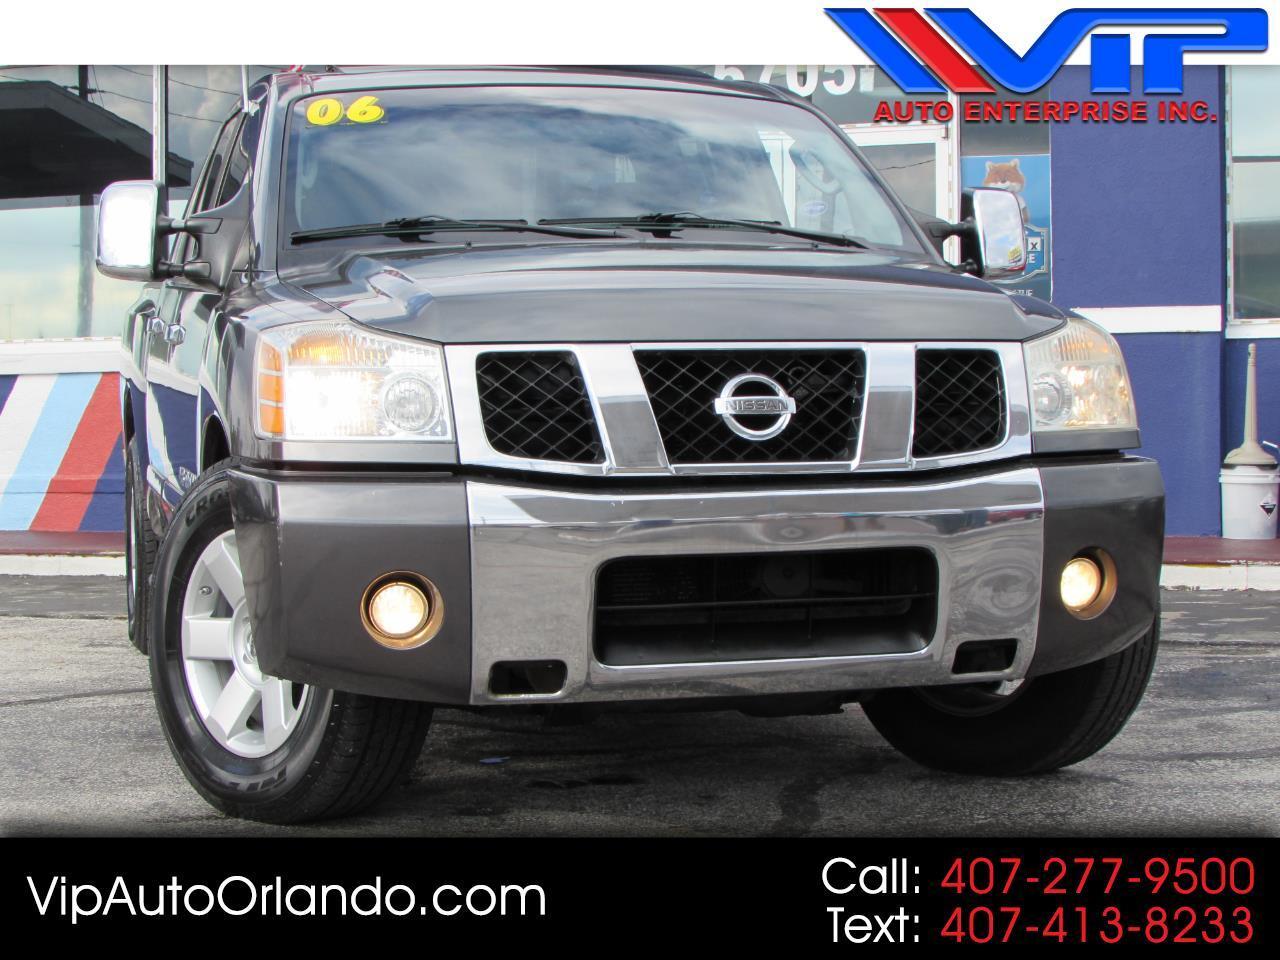 2006 Nissan Titan LE Crew Cab 2WD FFV